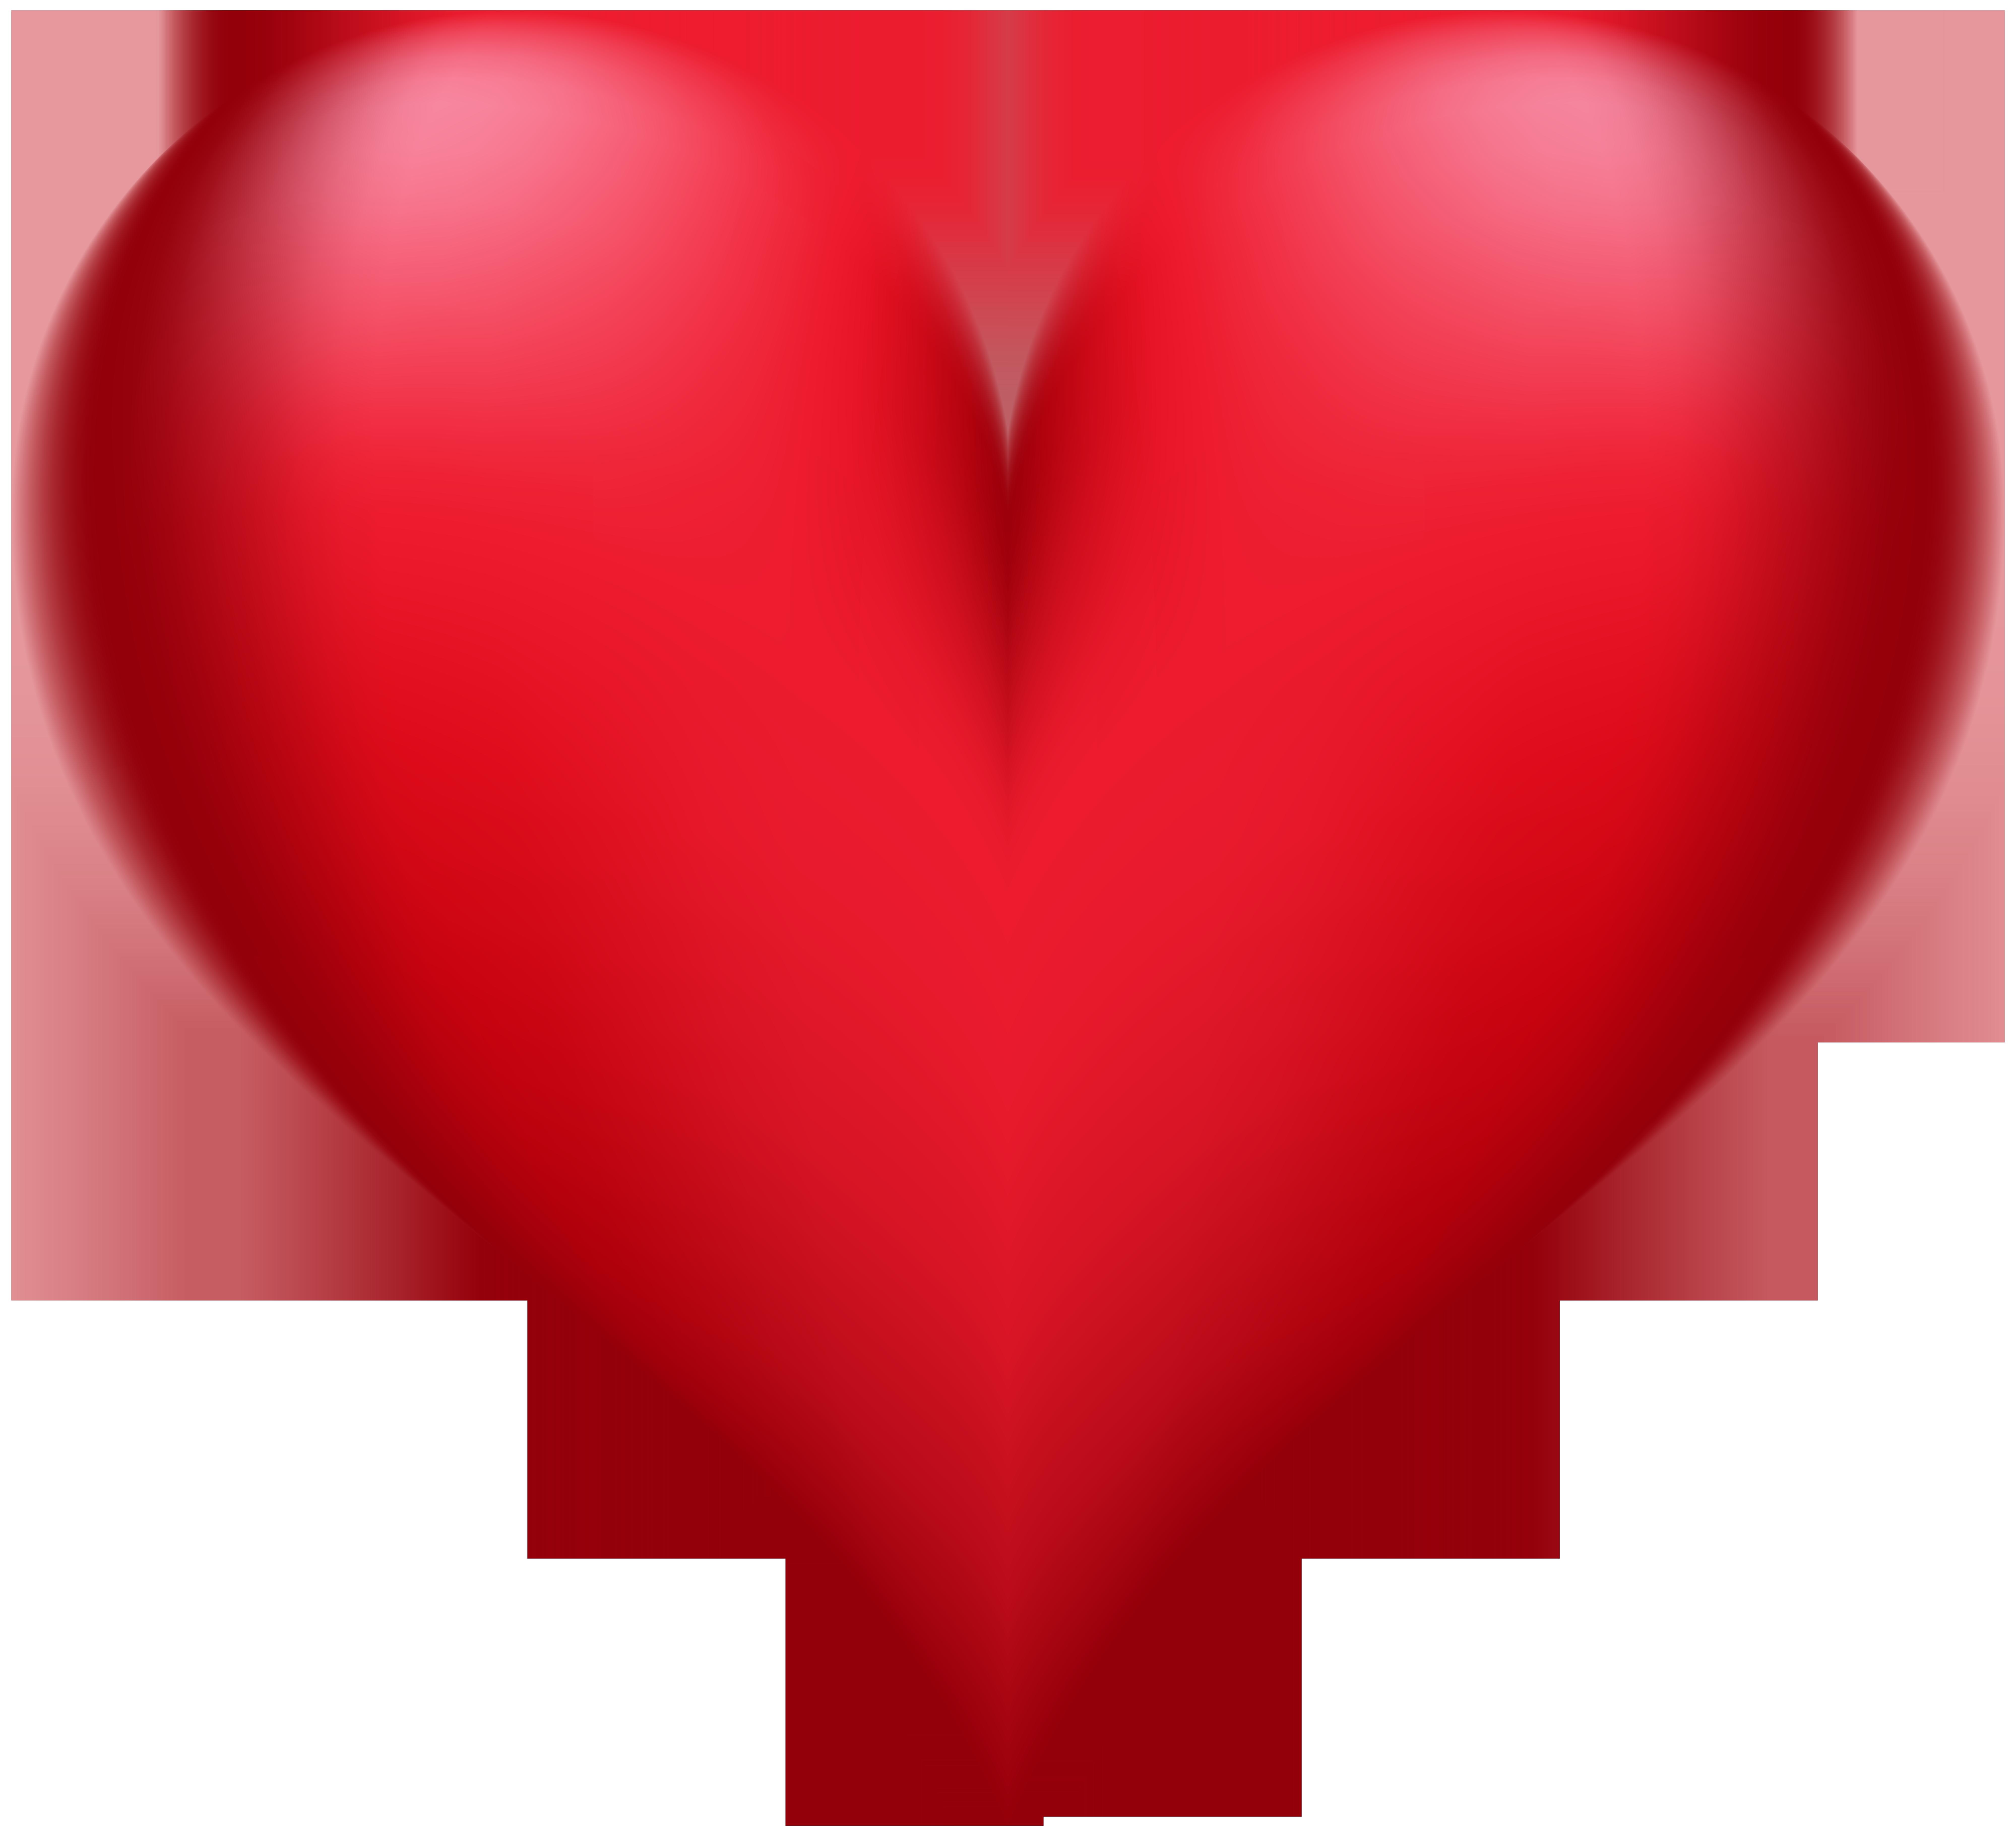 Heart Transparent Clip Art PNG Image.